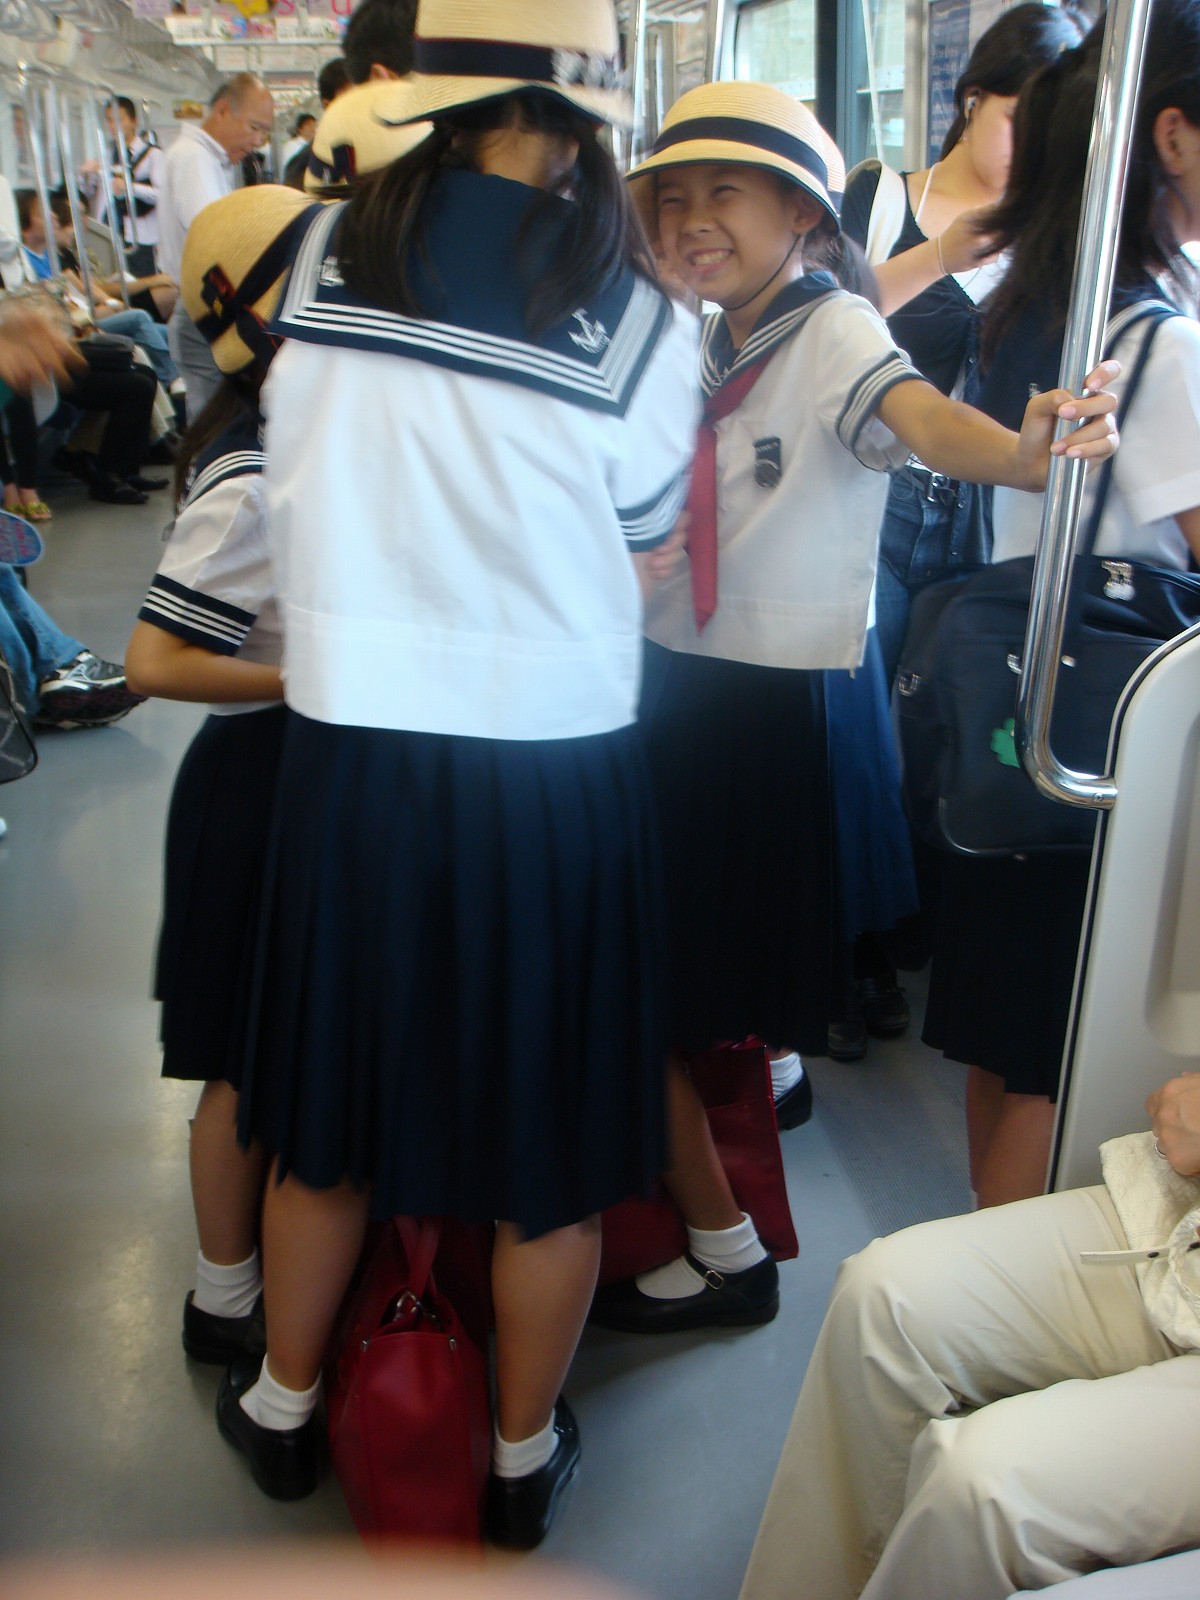 【毎朝】セーラー服を着た女子小学生【電車通学】->画像>57枚